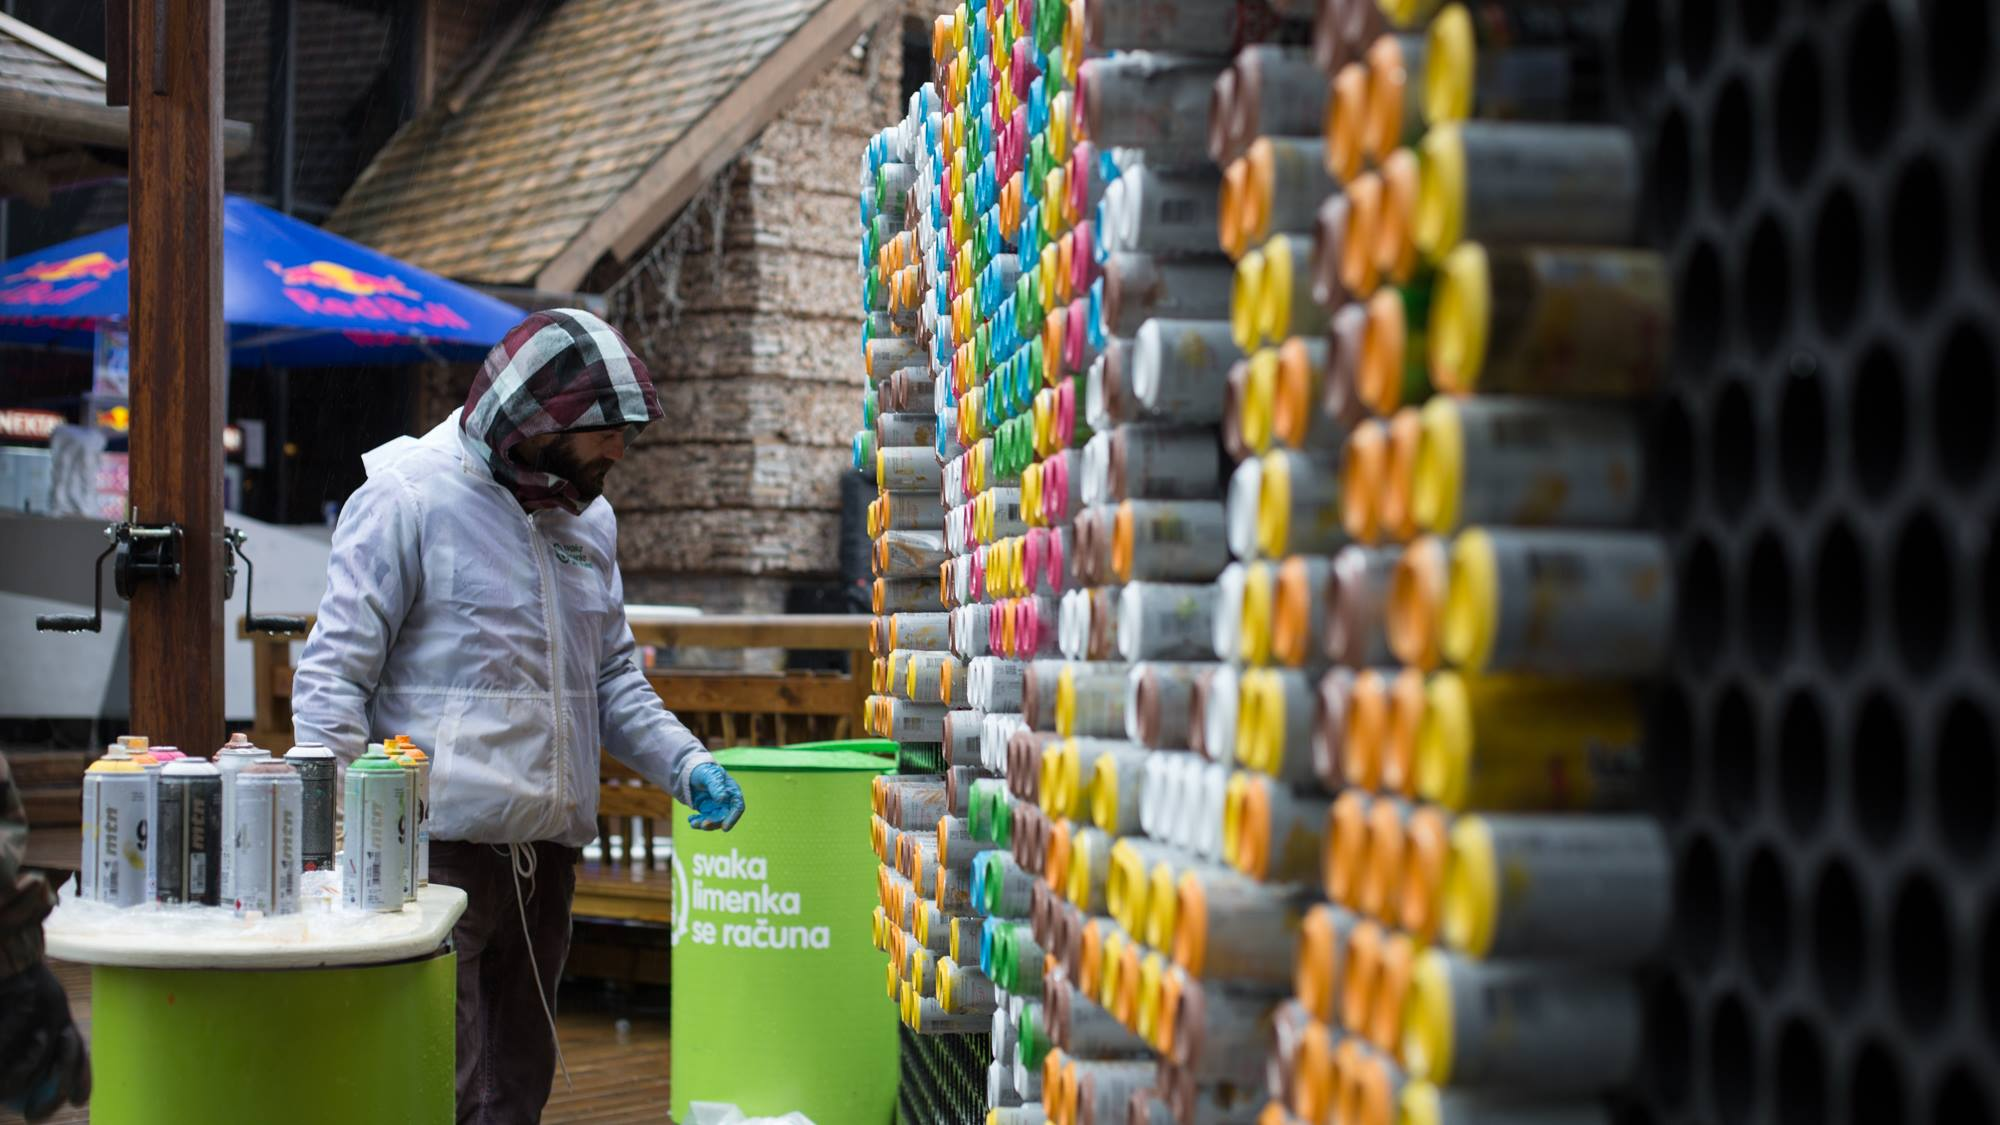 PIXELATA-photoAlquimia_ reciclaje de latas de refresco pintadas